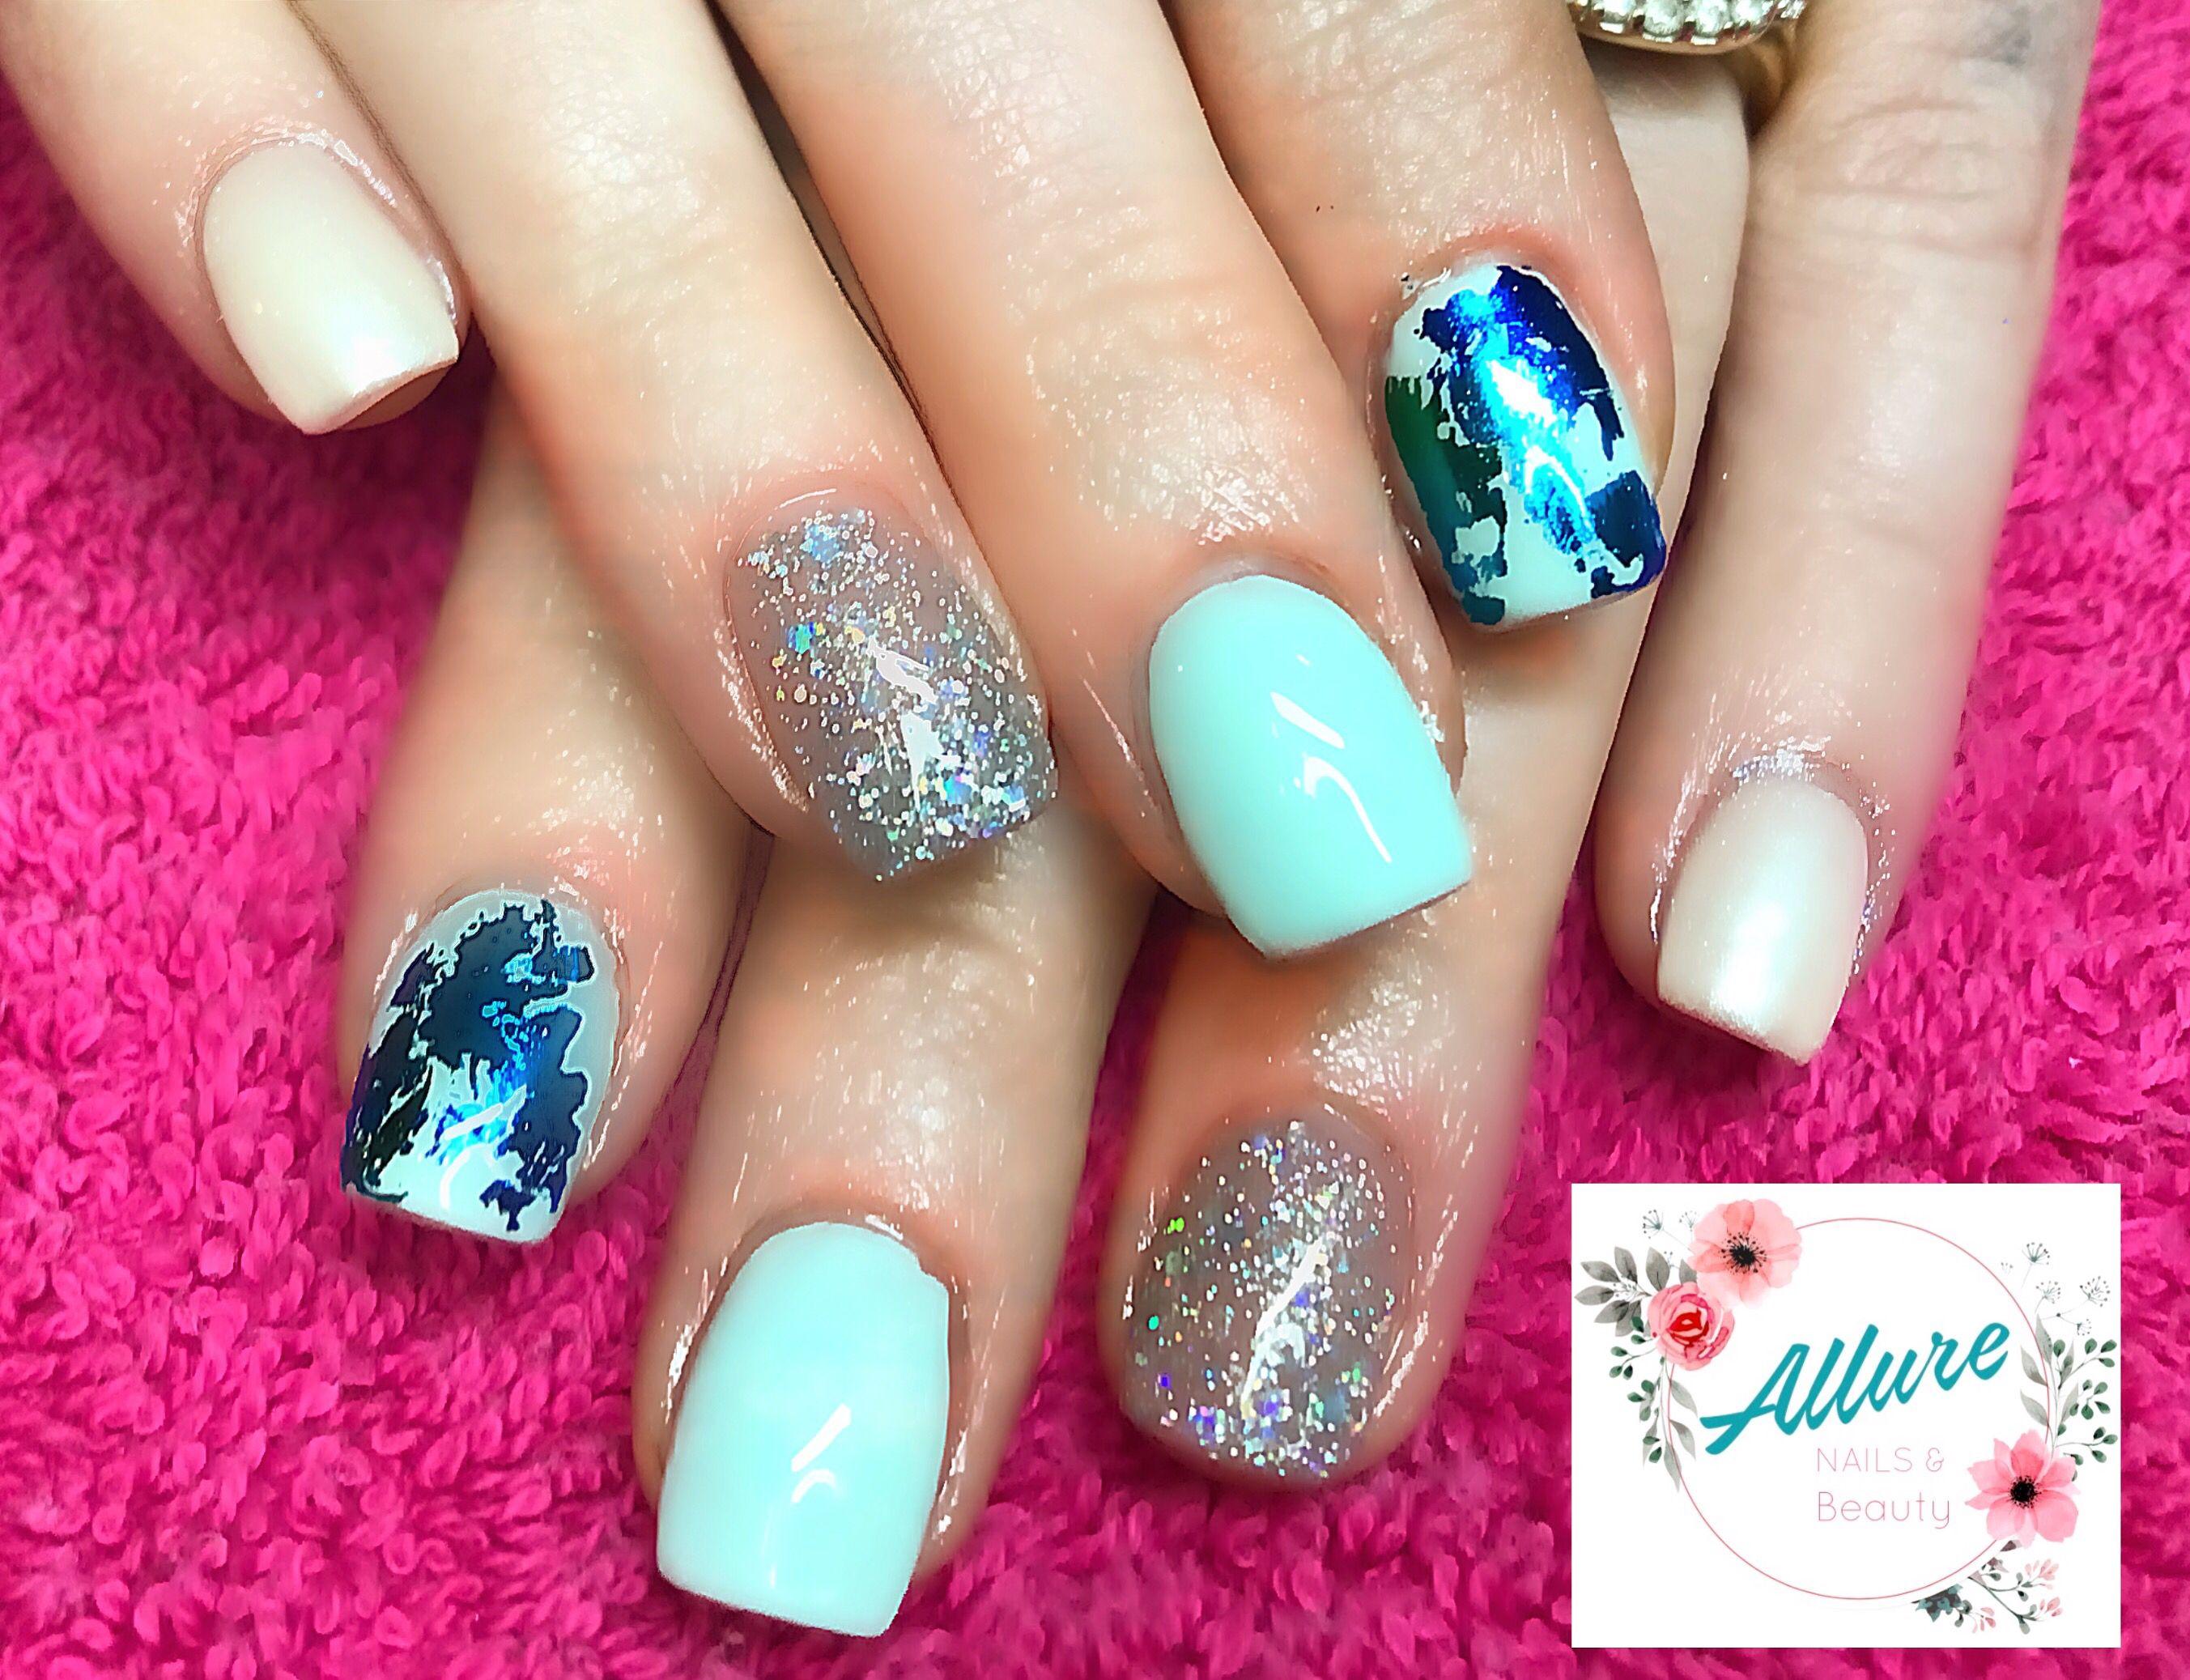 Gel polish over acrylic #classy   Nails, Acrylic nails